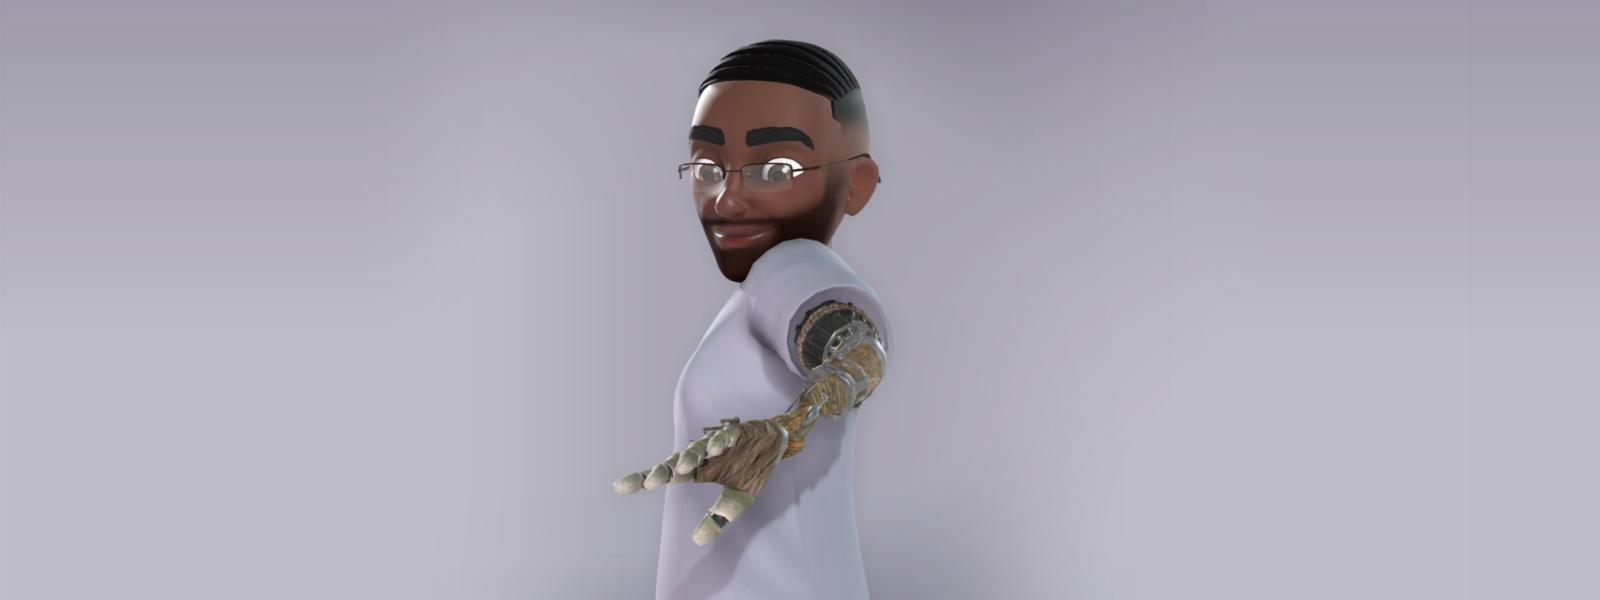 Un avatar Xbox regarde son bras prothétique